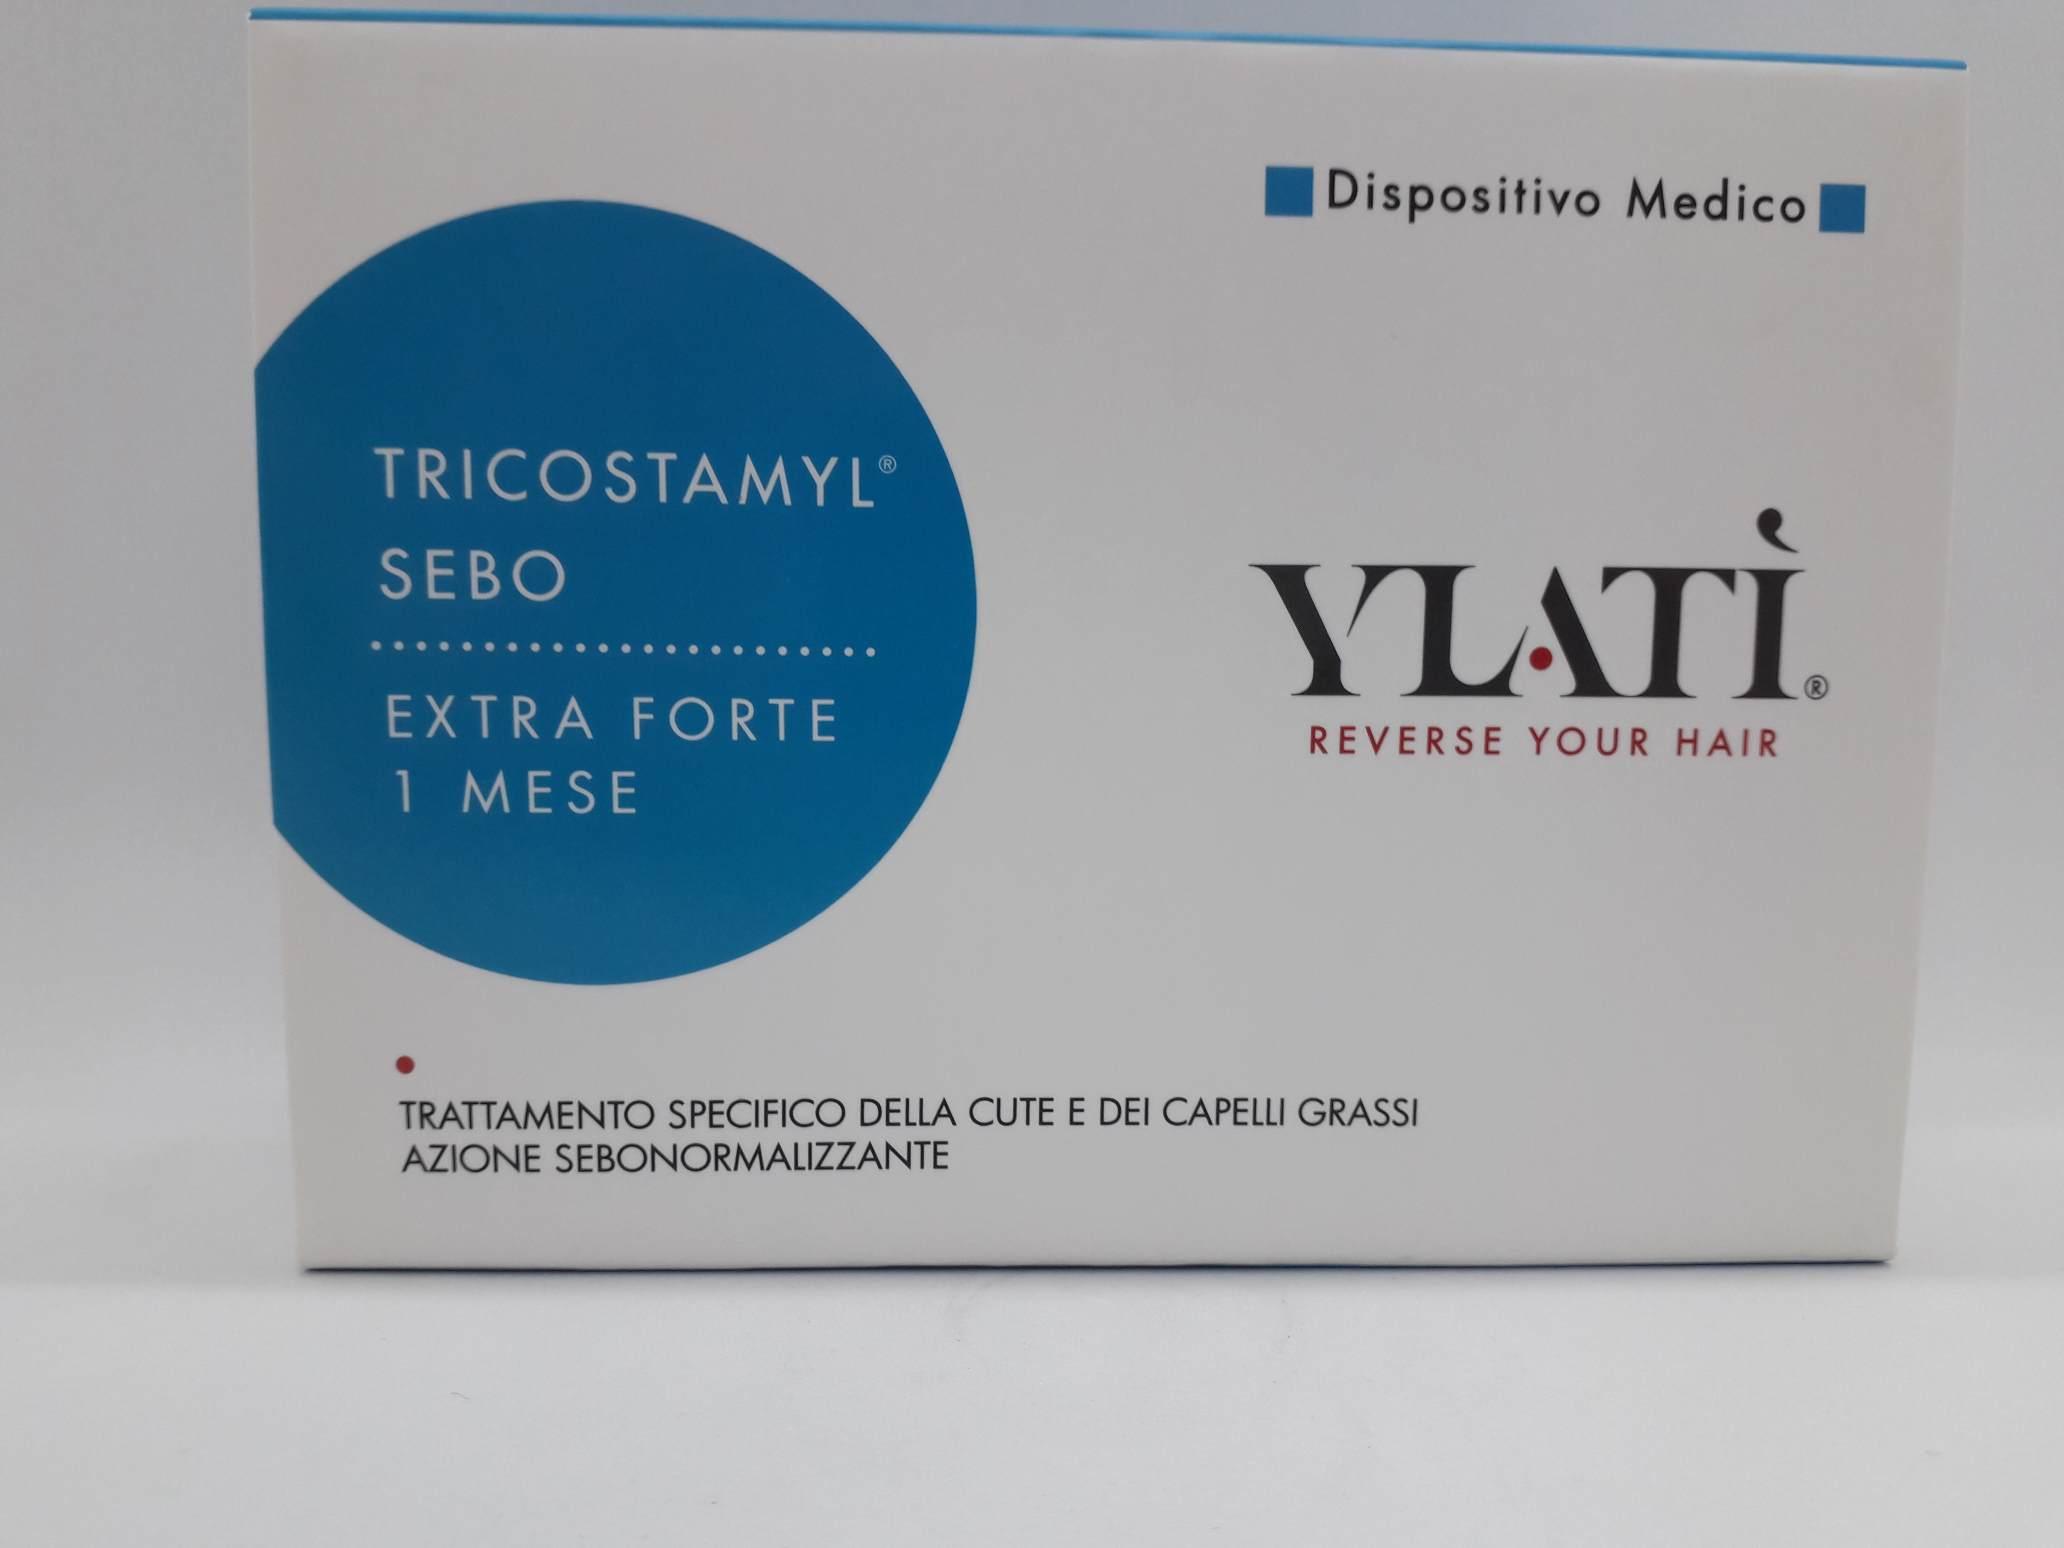 YLATI TRICOSTAMYL SEBO 30 ML MONODOSE DM 1 - Farmaciaempatica.it